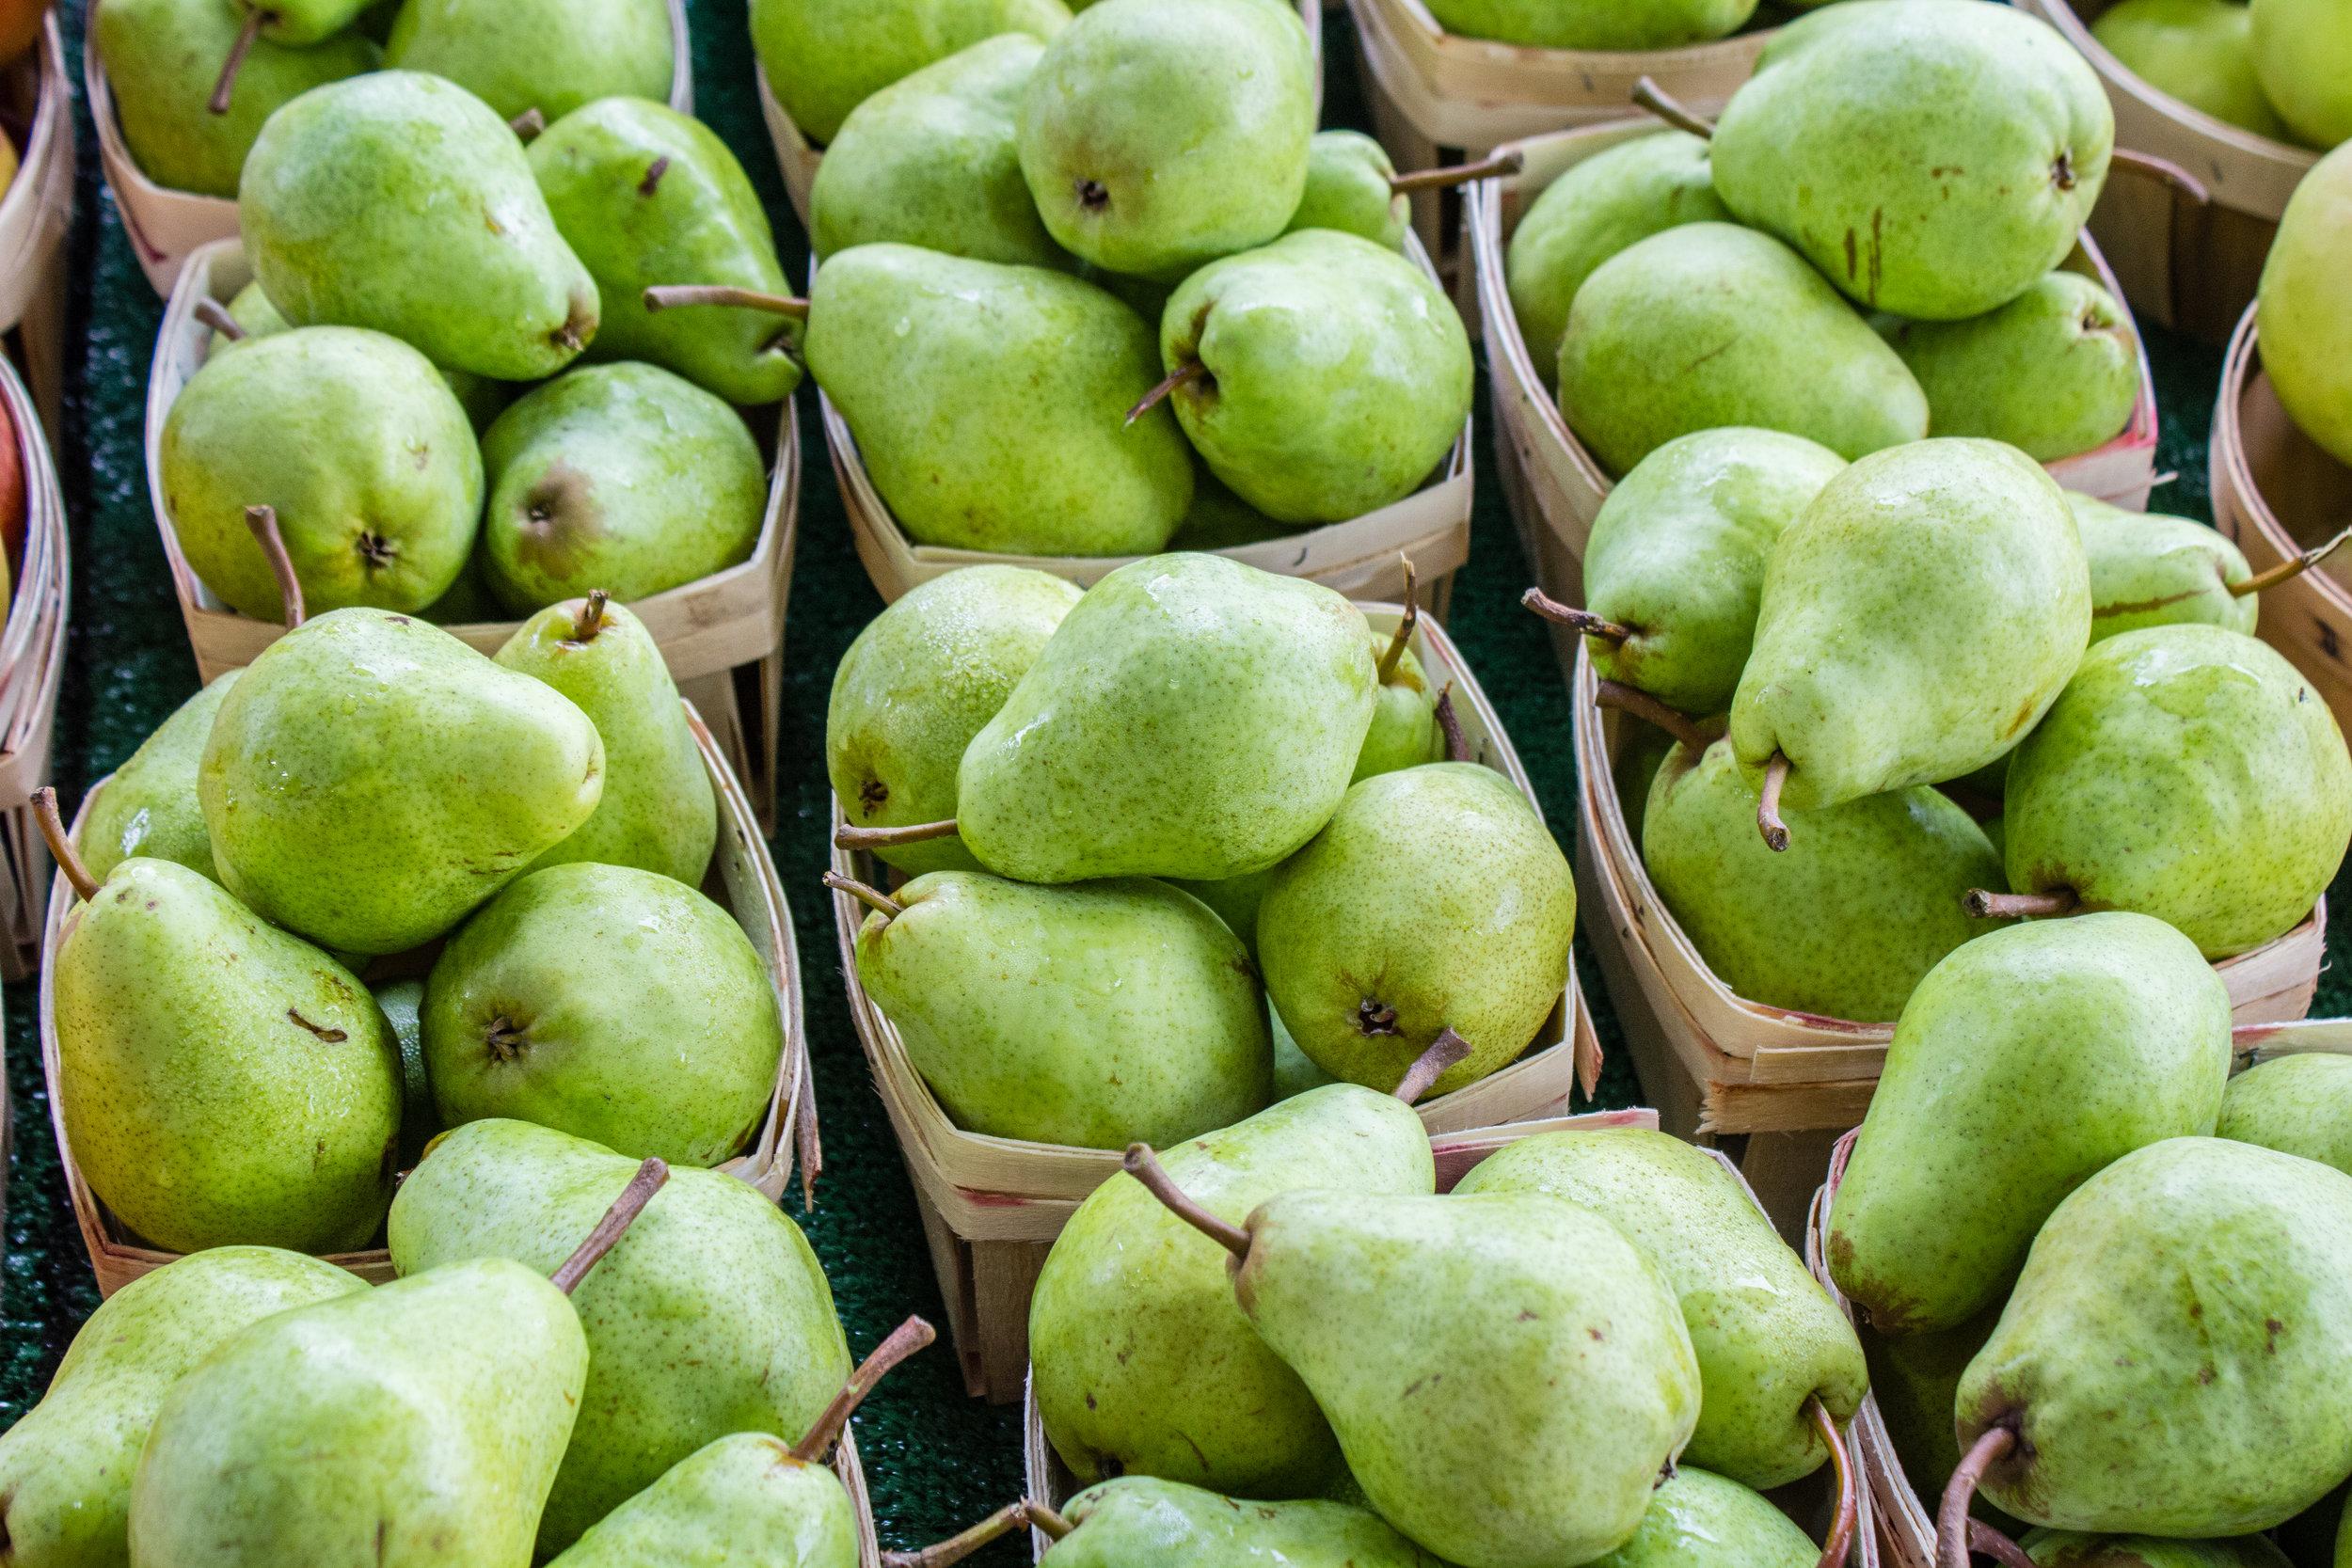 Pears -